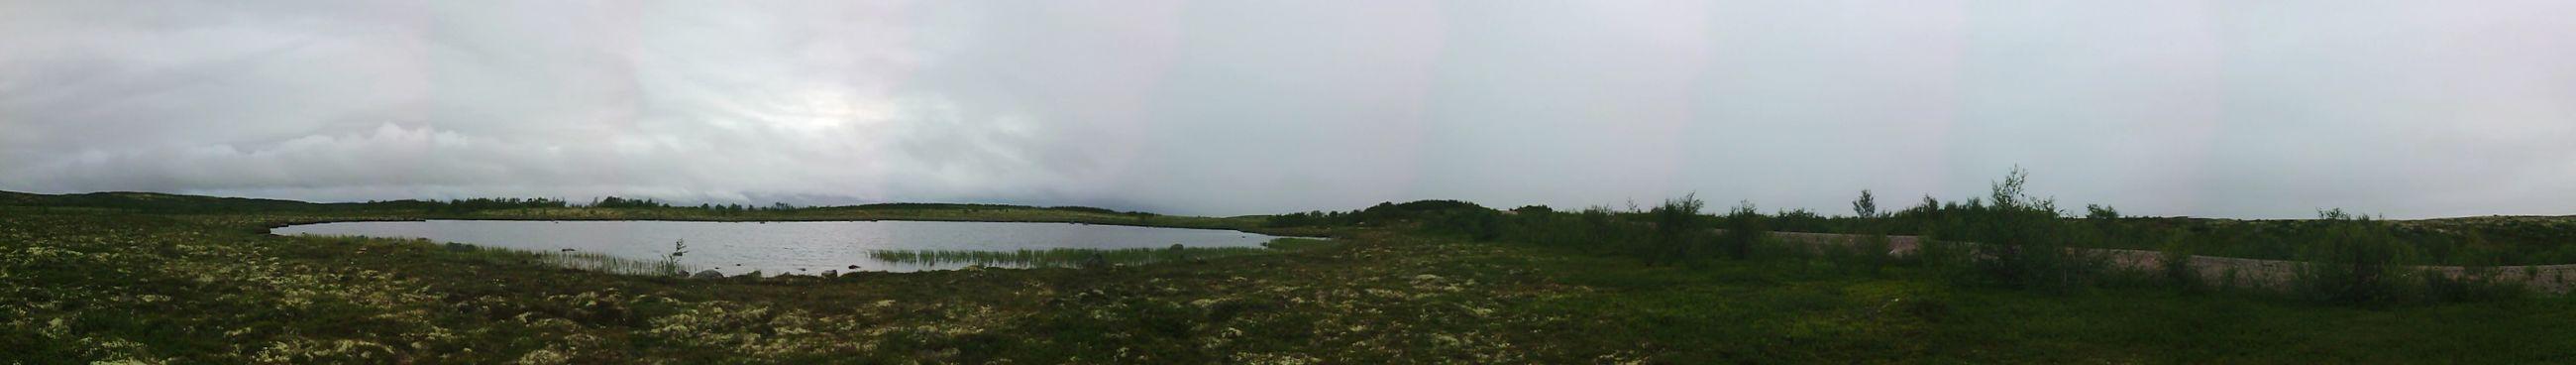 Tundra Landscape Teriberka Lake Water